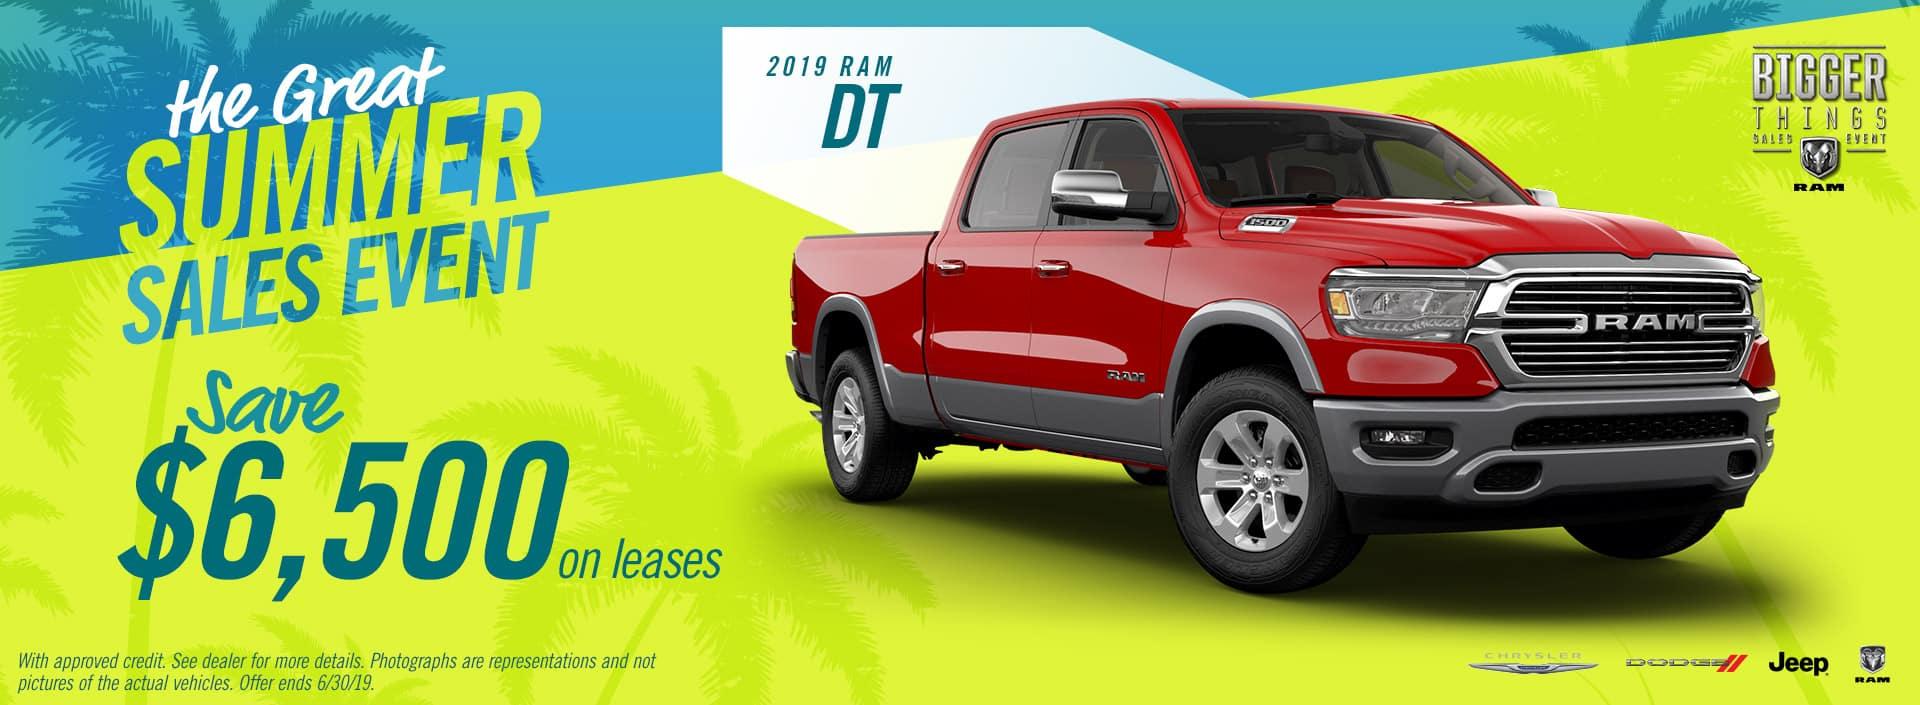 RAM DT | Decatur, IN